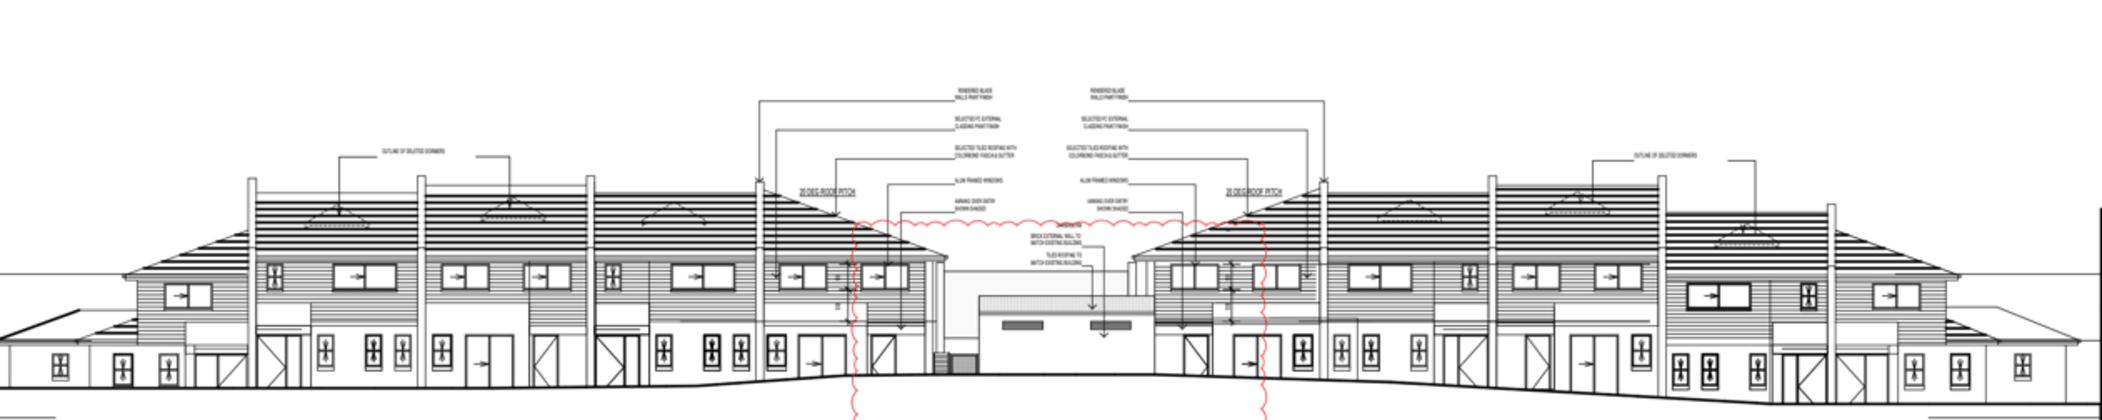 Planning Image: Urban Link